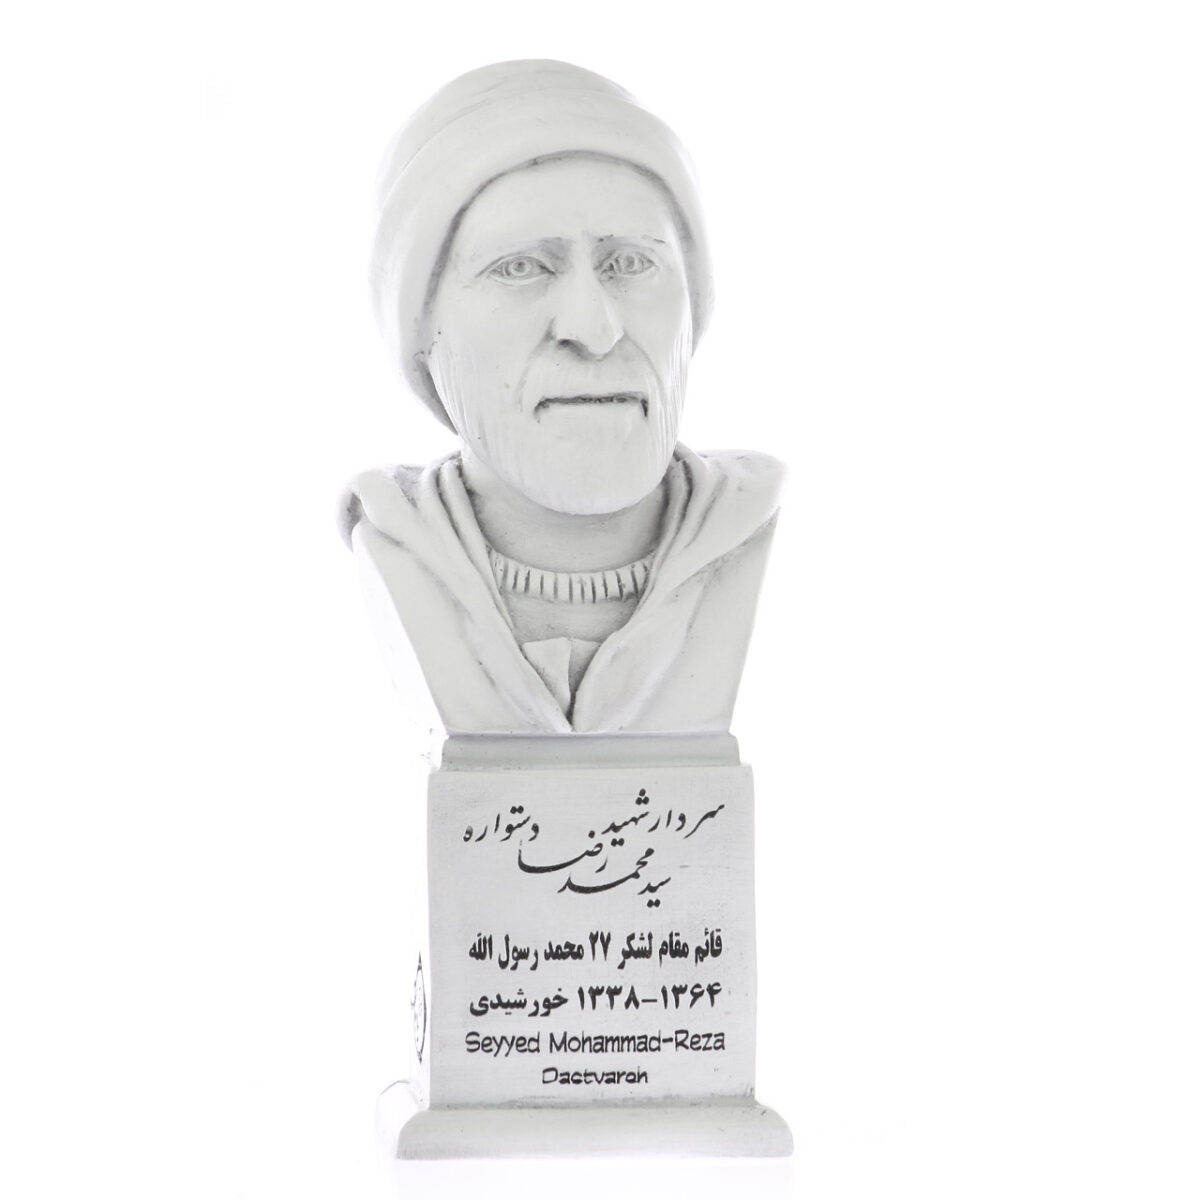 mohammadreza dastvare s 1200x1200 - سردیس شهید محمدرضا دستواره